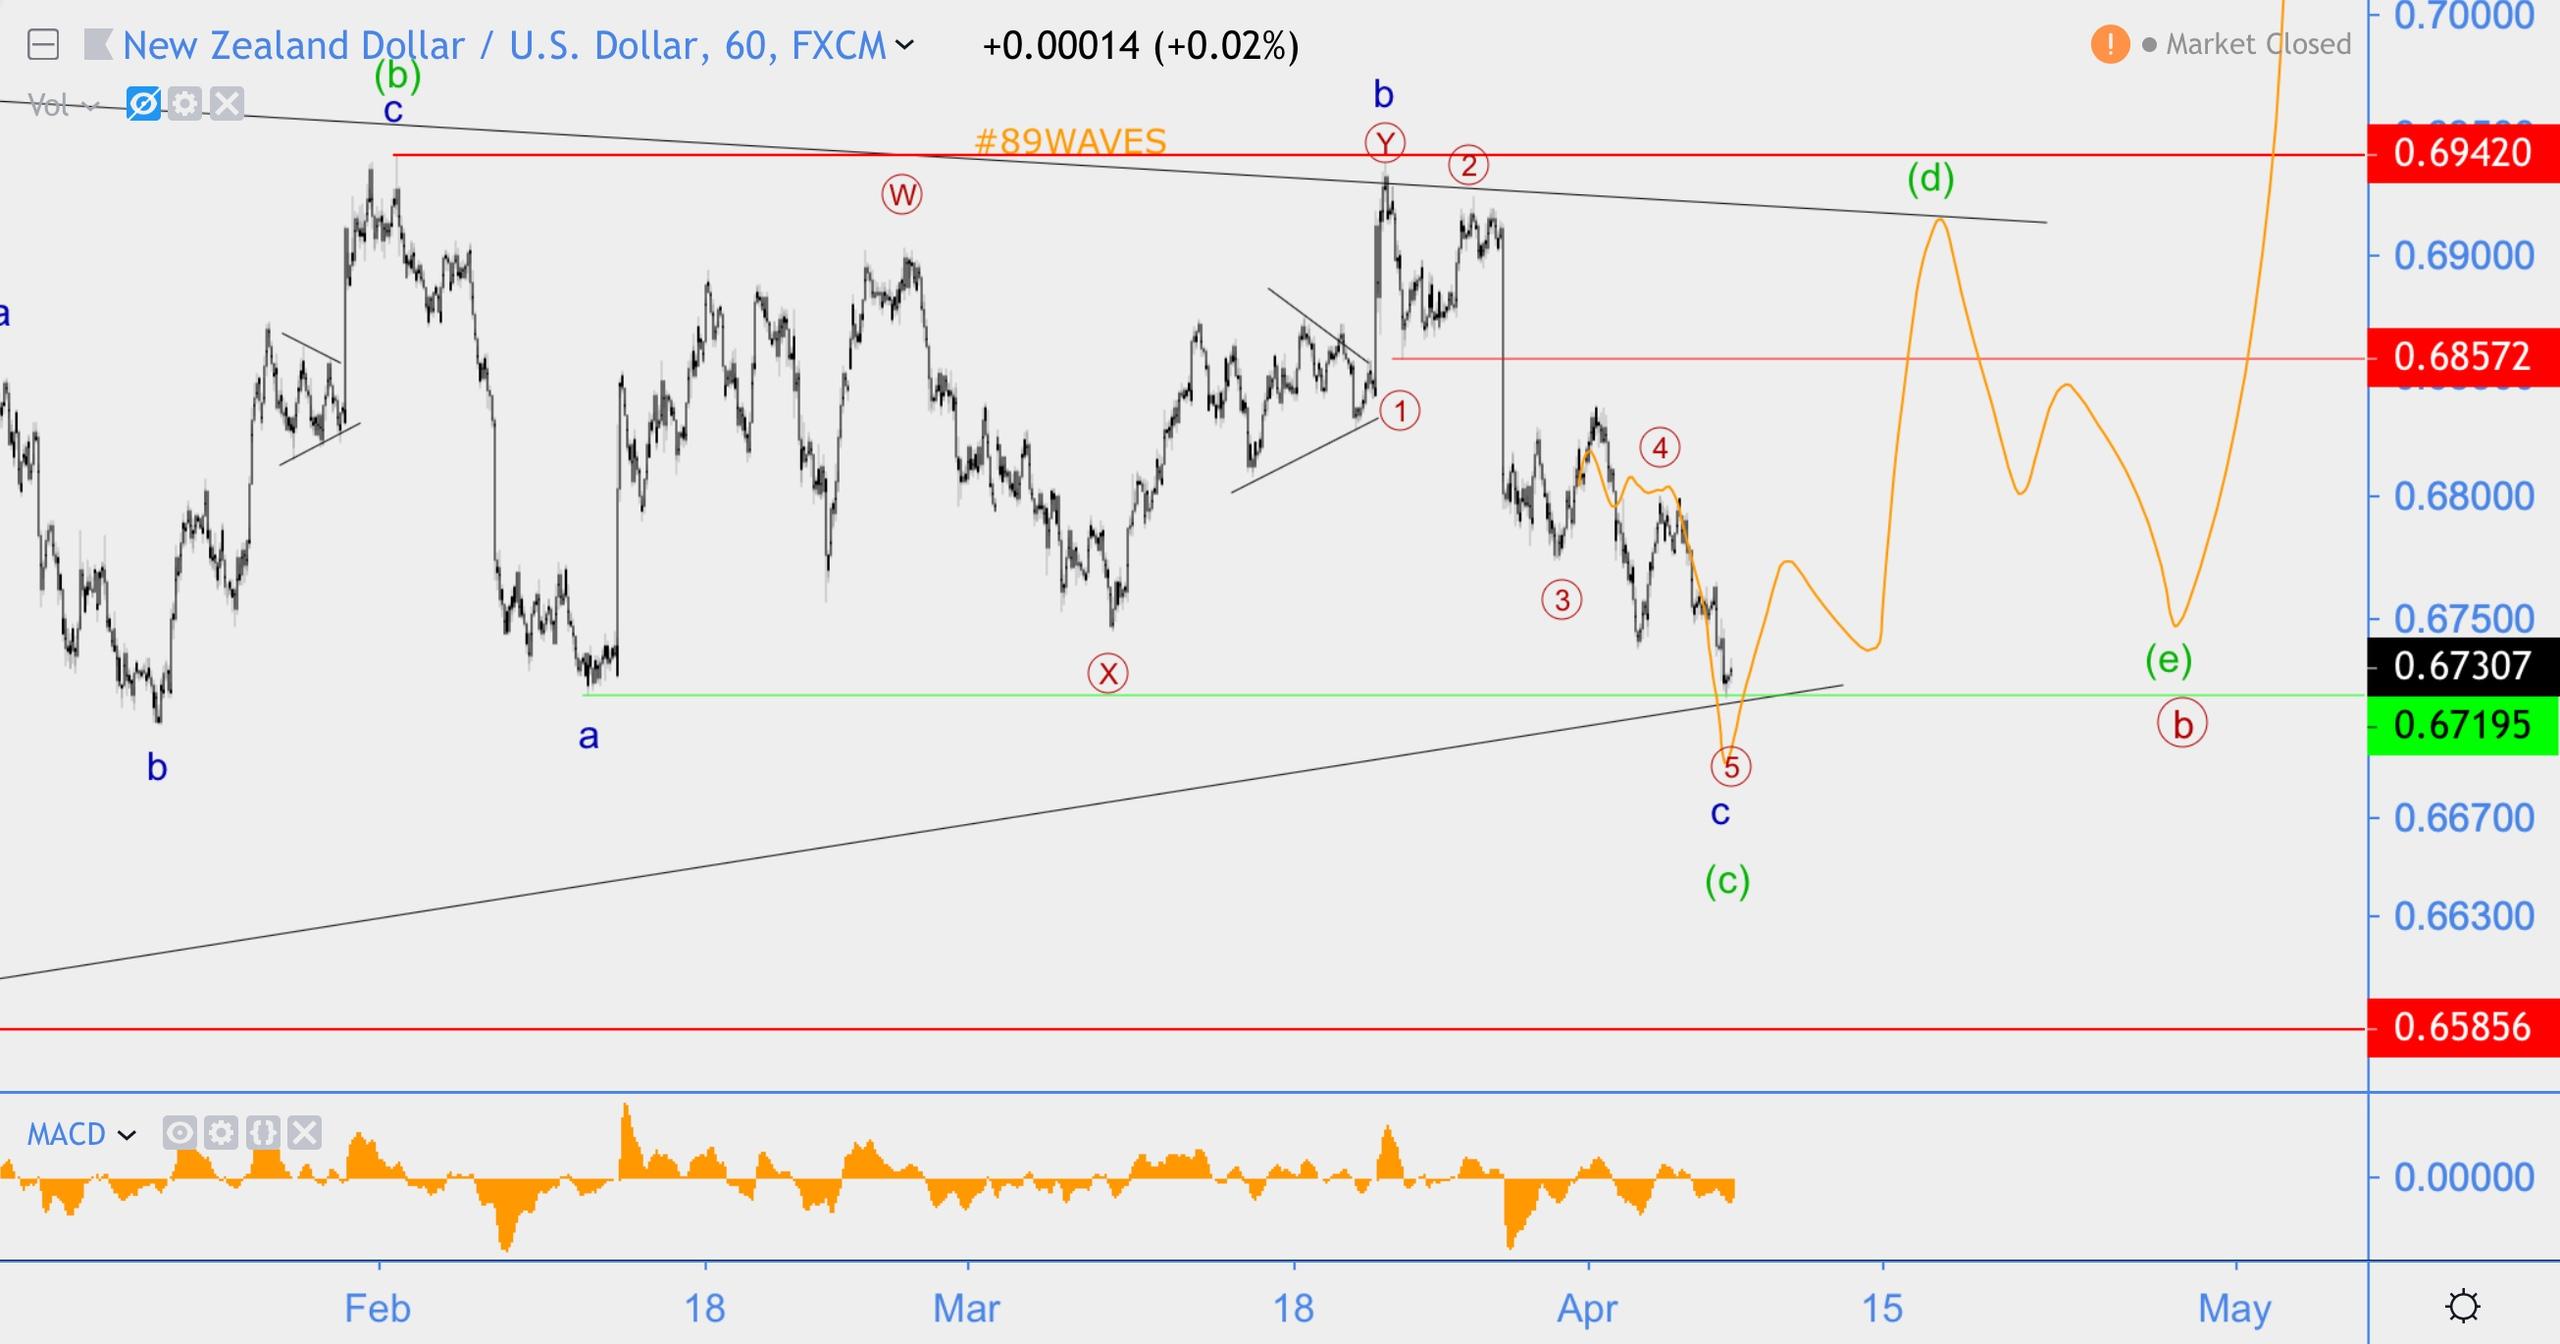 Волновой анализ NZD/USD, AUD/USD, BTC/USD хронология